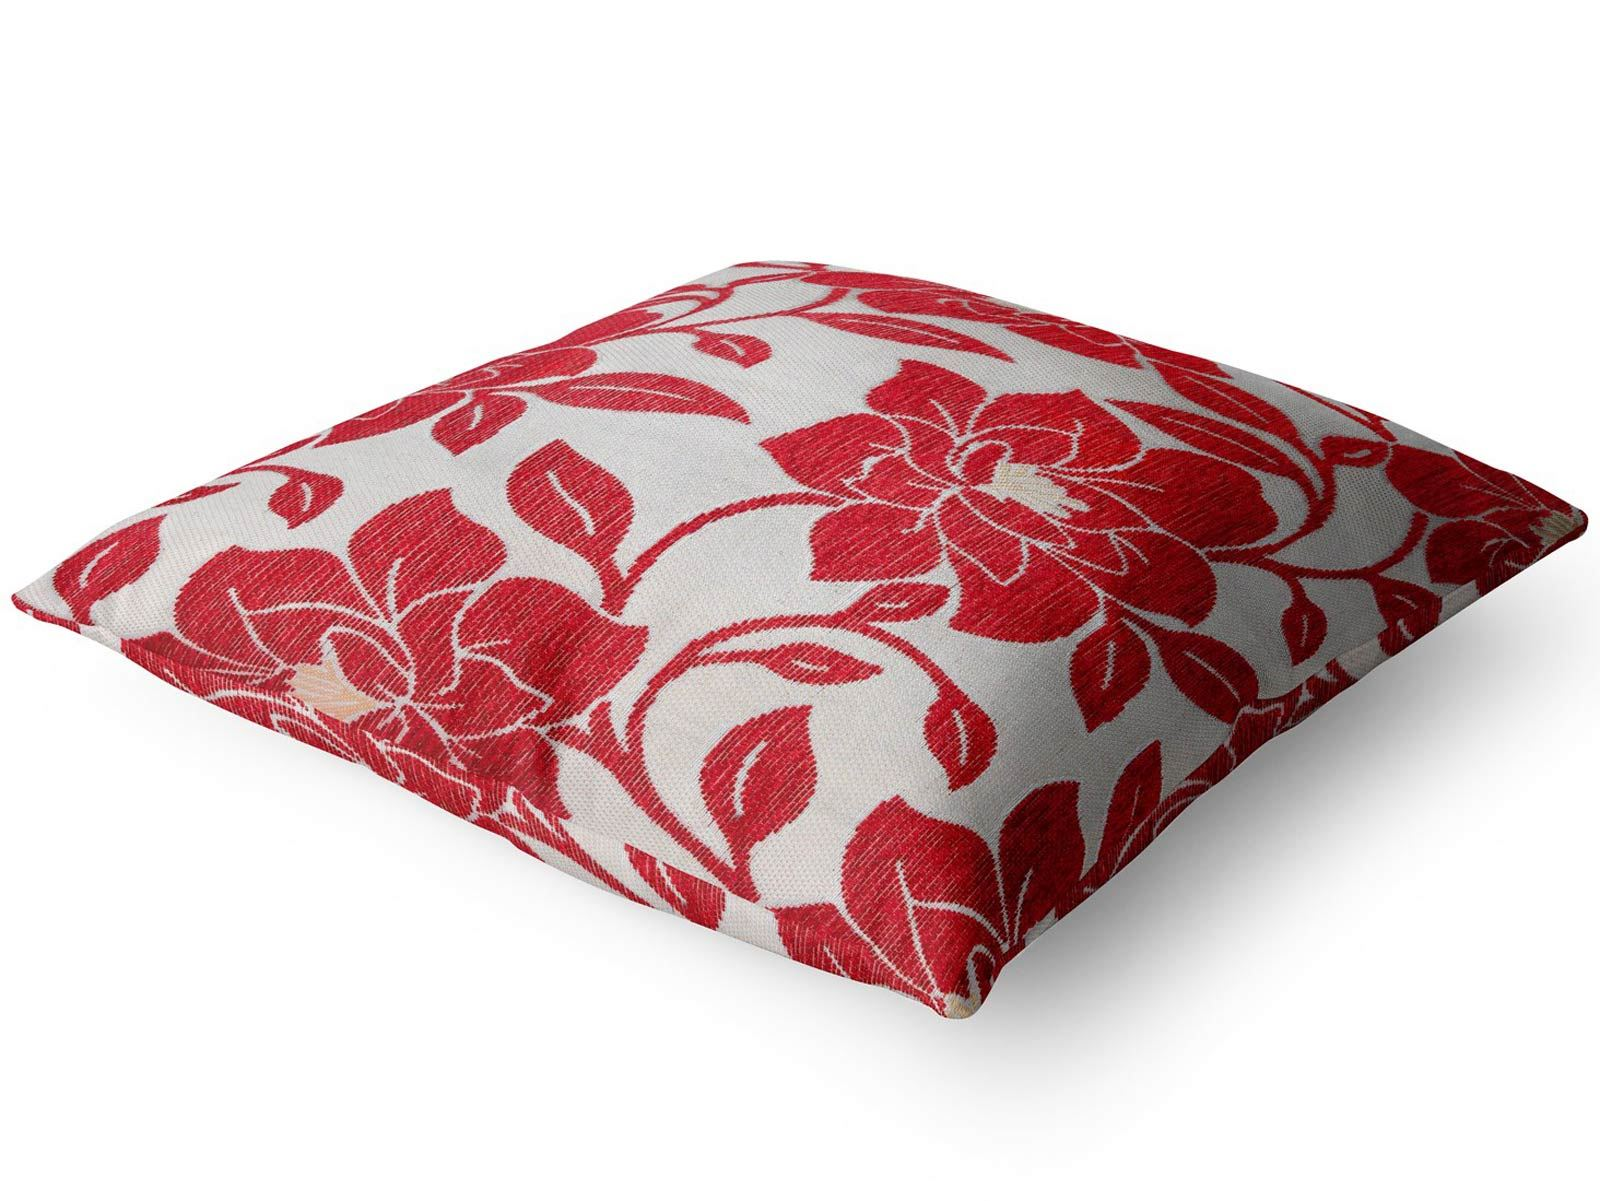 Vino-Tinto-Cushion-Covers-Coleccion-17-034-18-034-43cm-45cm-Cubierta miniatura 51